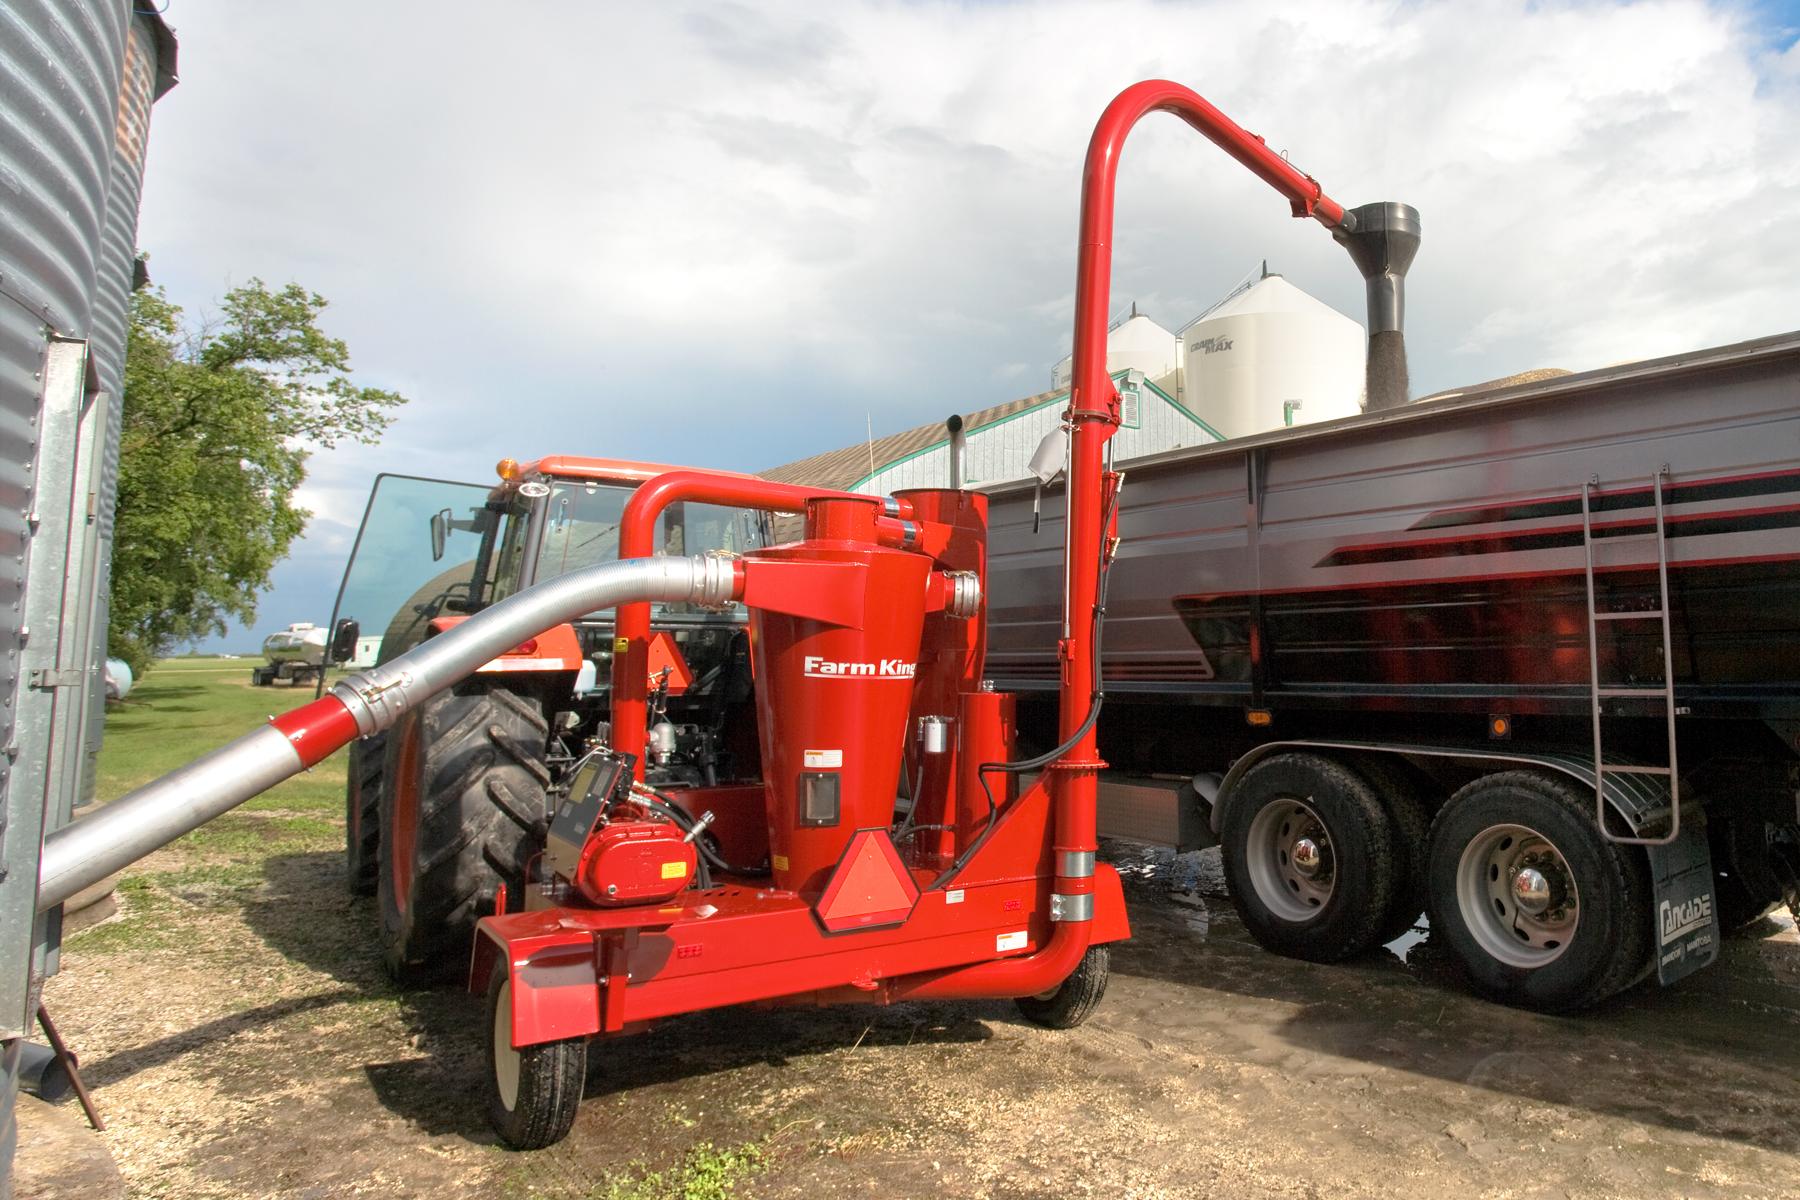 Buhler Farm King Grain Vac – Linndale